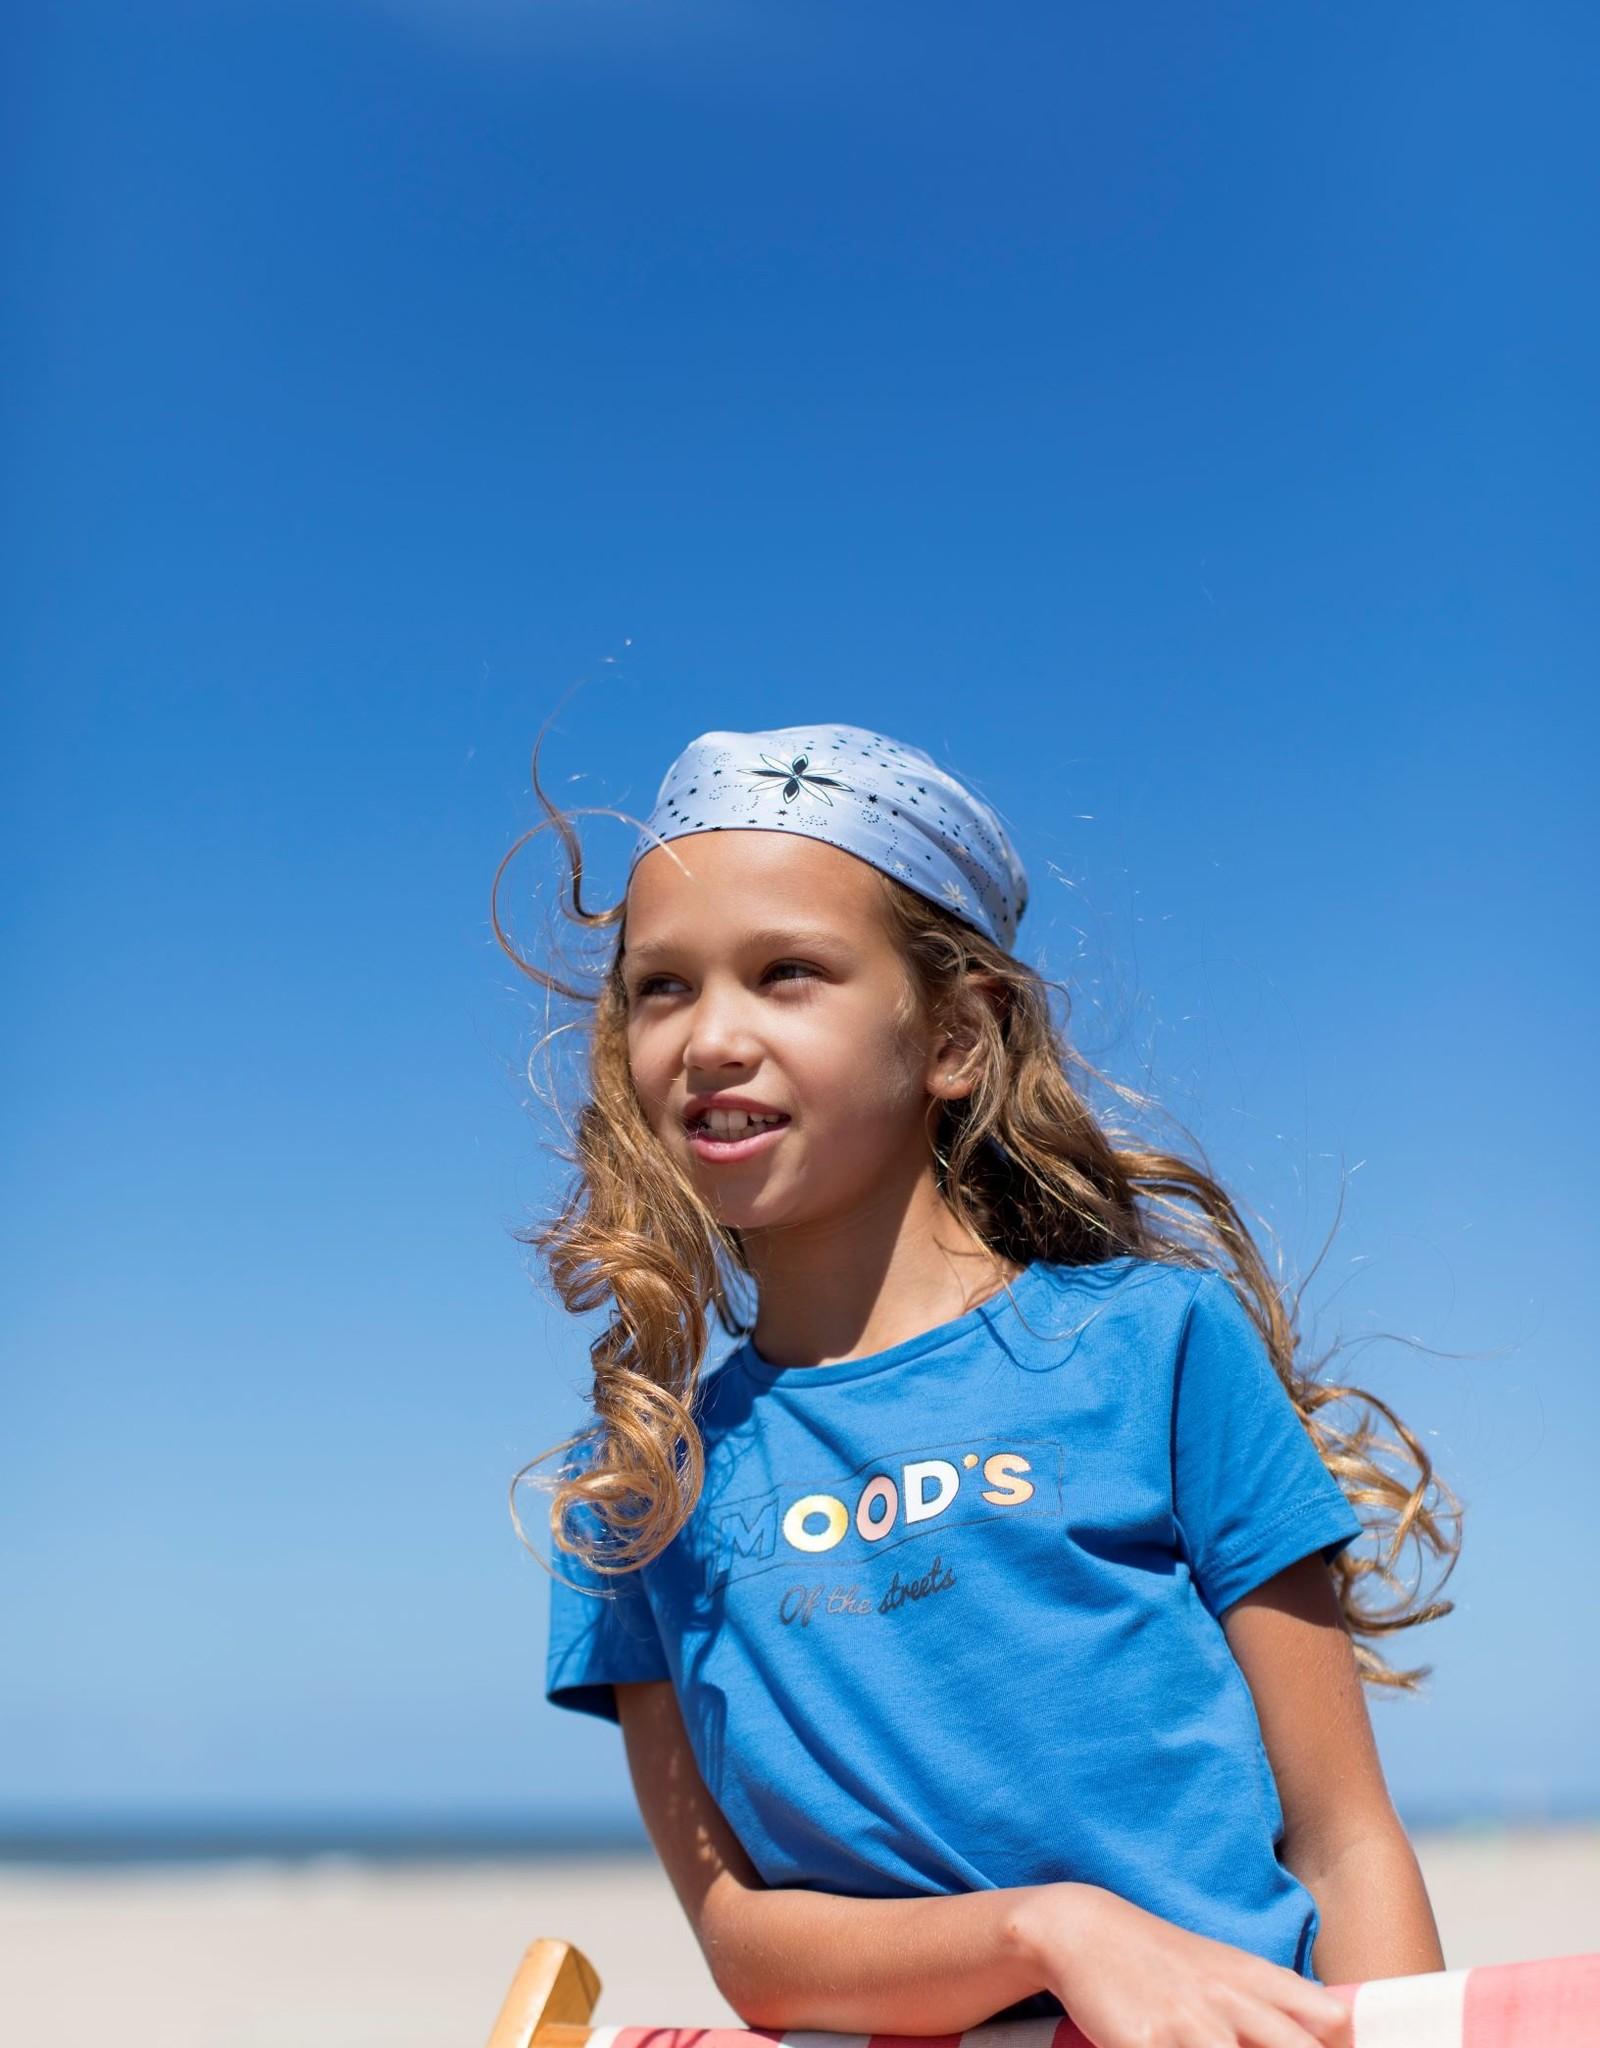 Moodstreet Moodstreet shirt 5400 simply blue